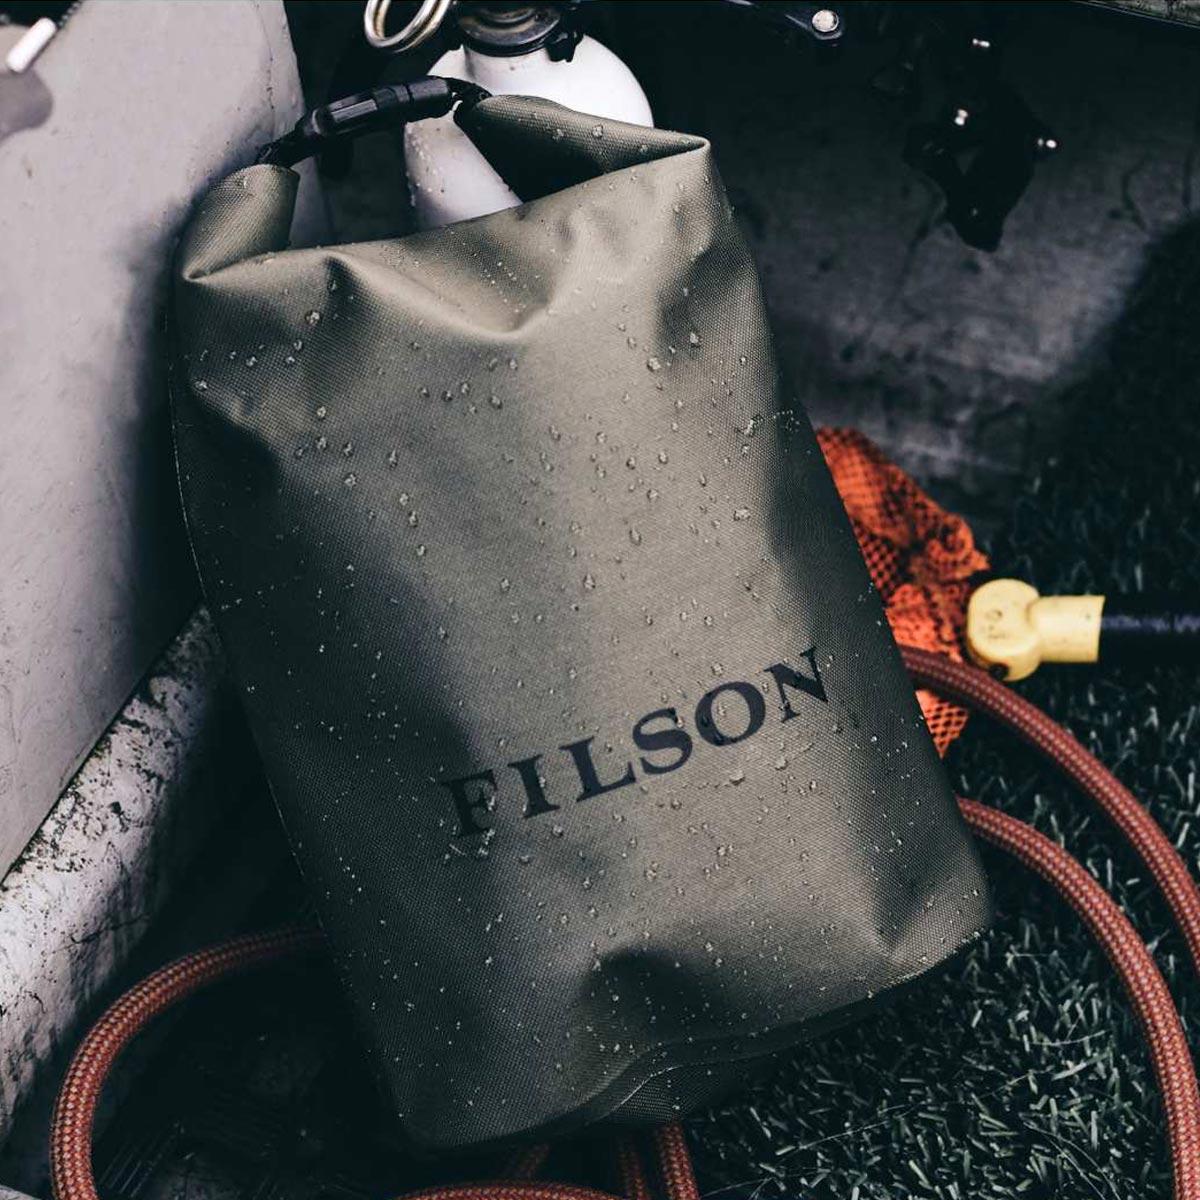 Filson Dry Bag Small, waterproof and lightweight